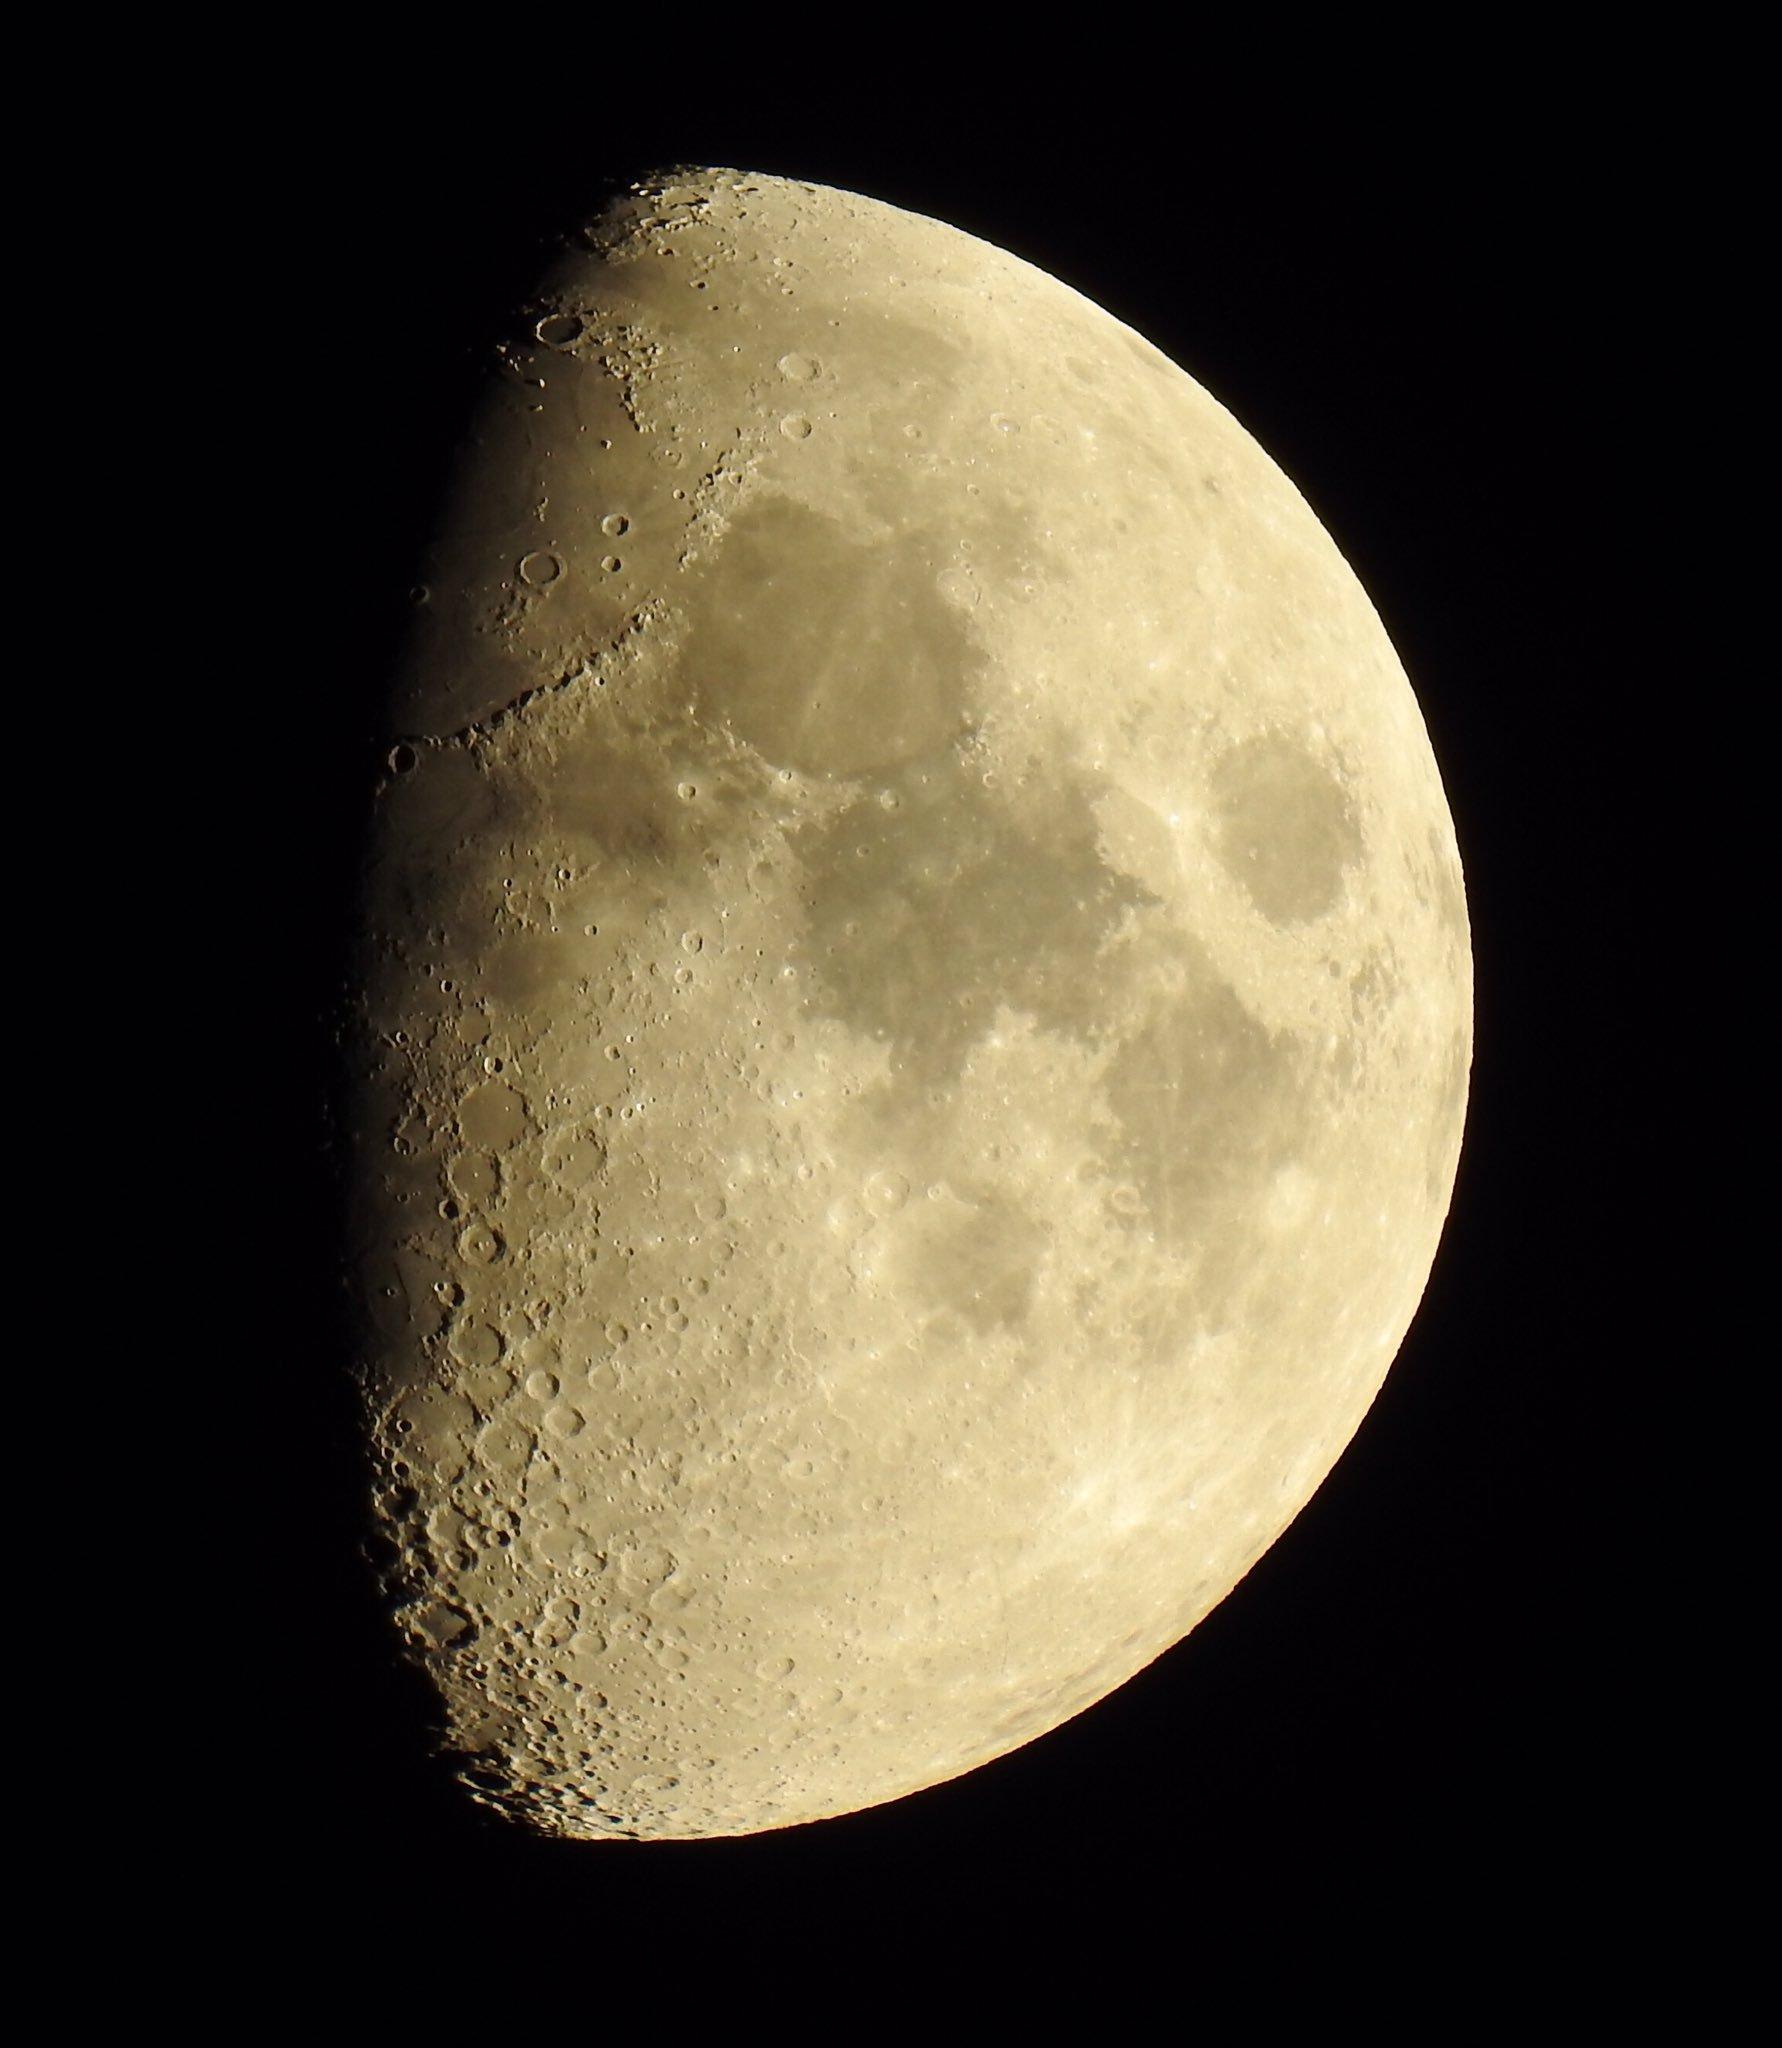 Potente observación lunar sin telescopio